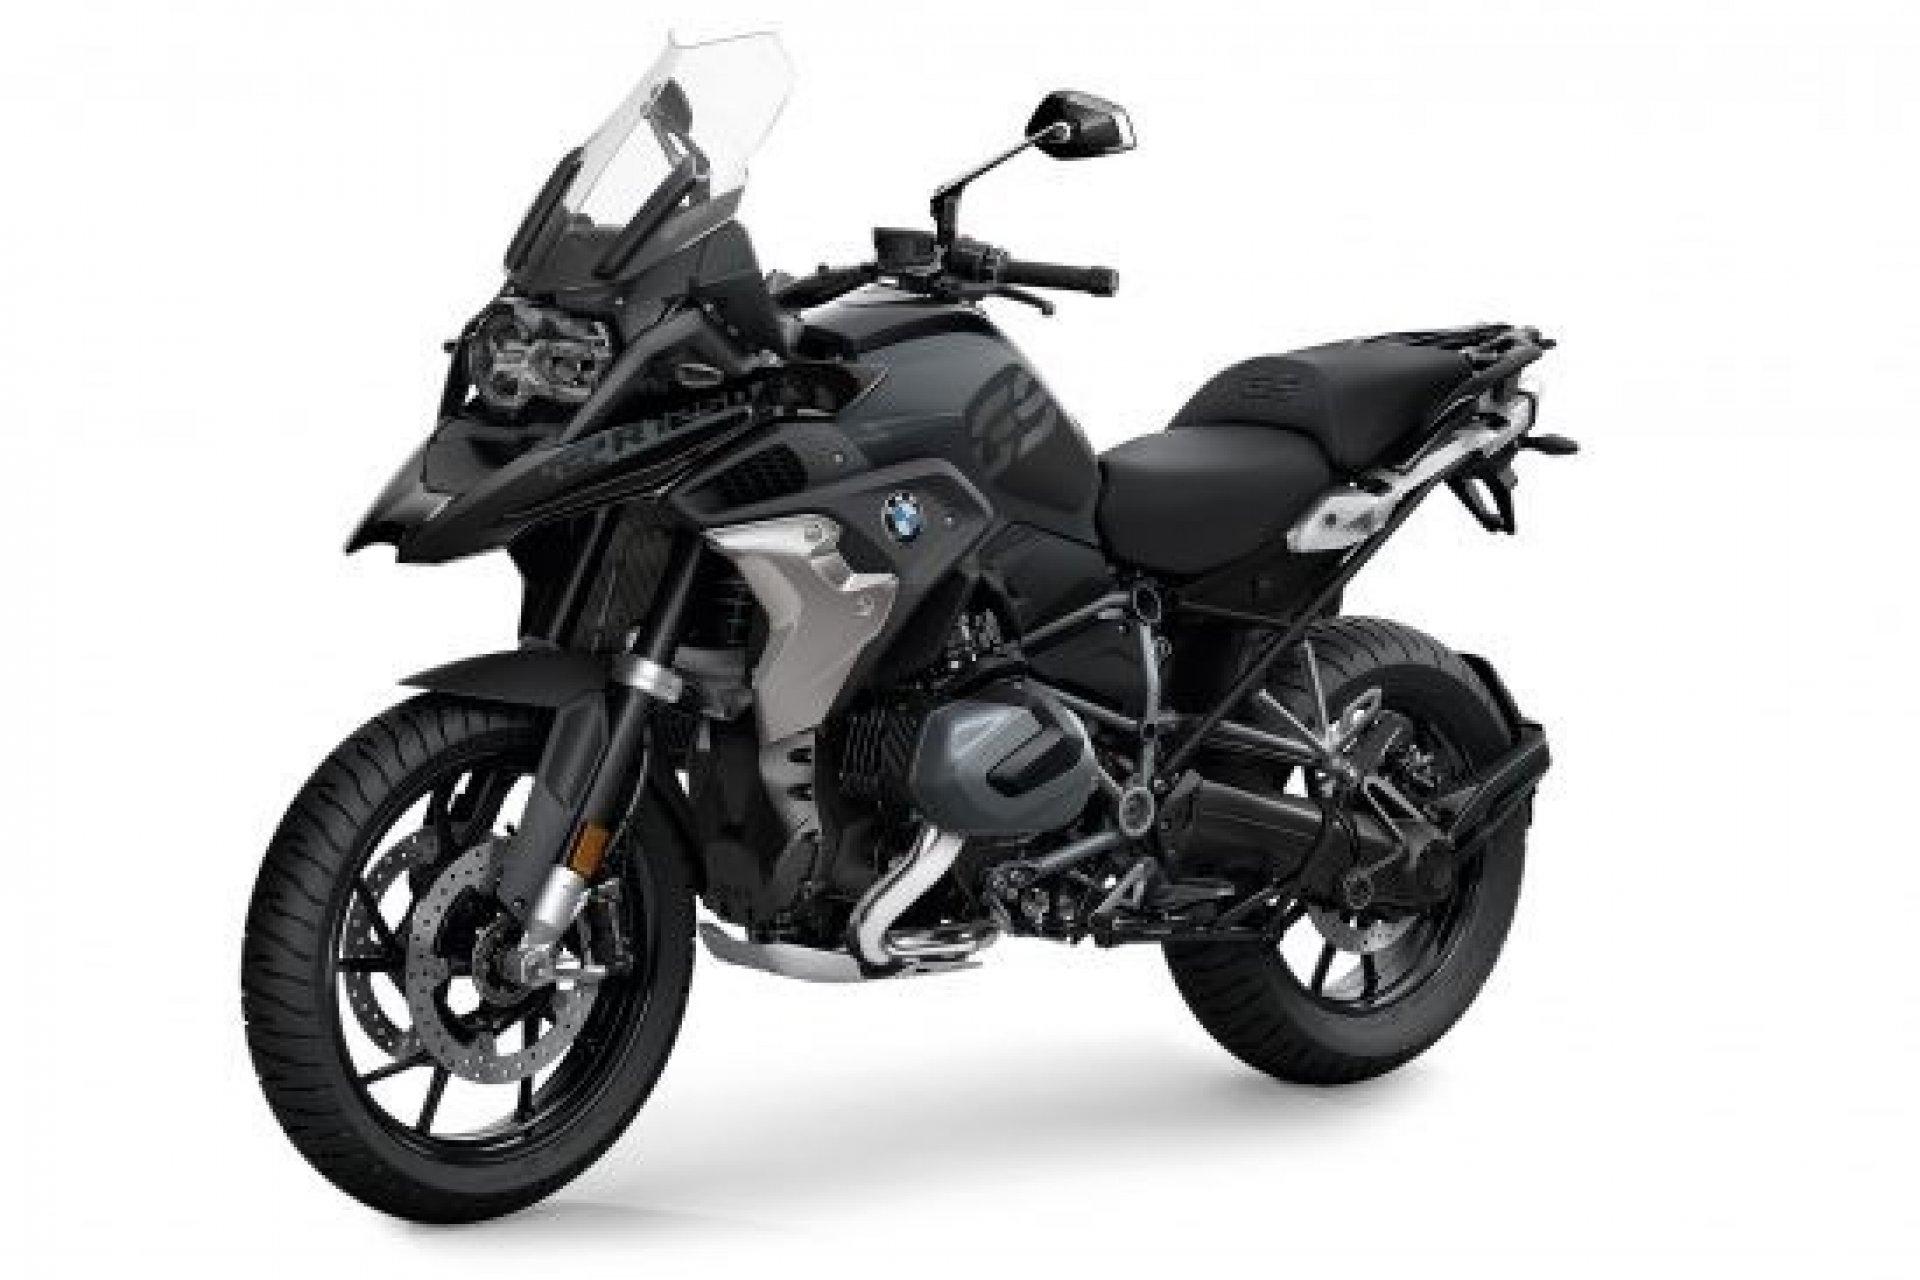 100120-2021-bmw-r1250gs-adventure-P90401150-549x388